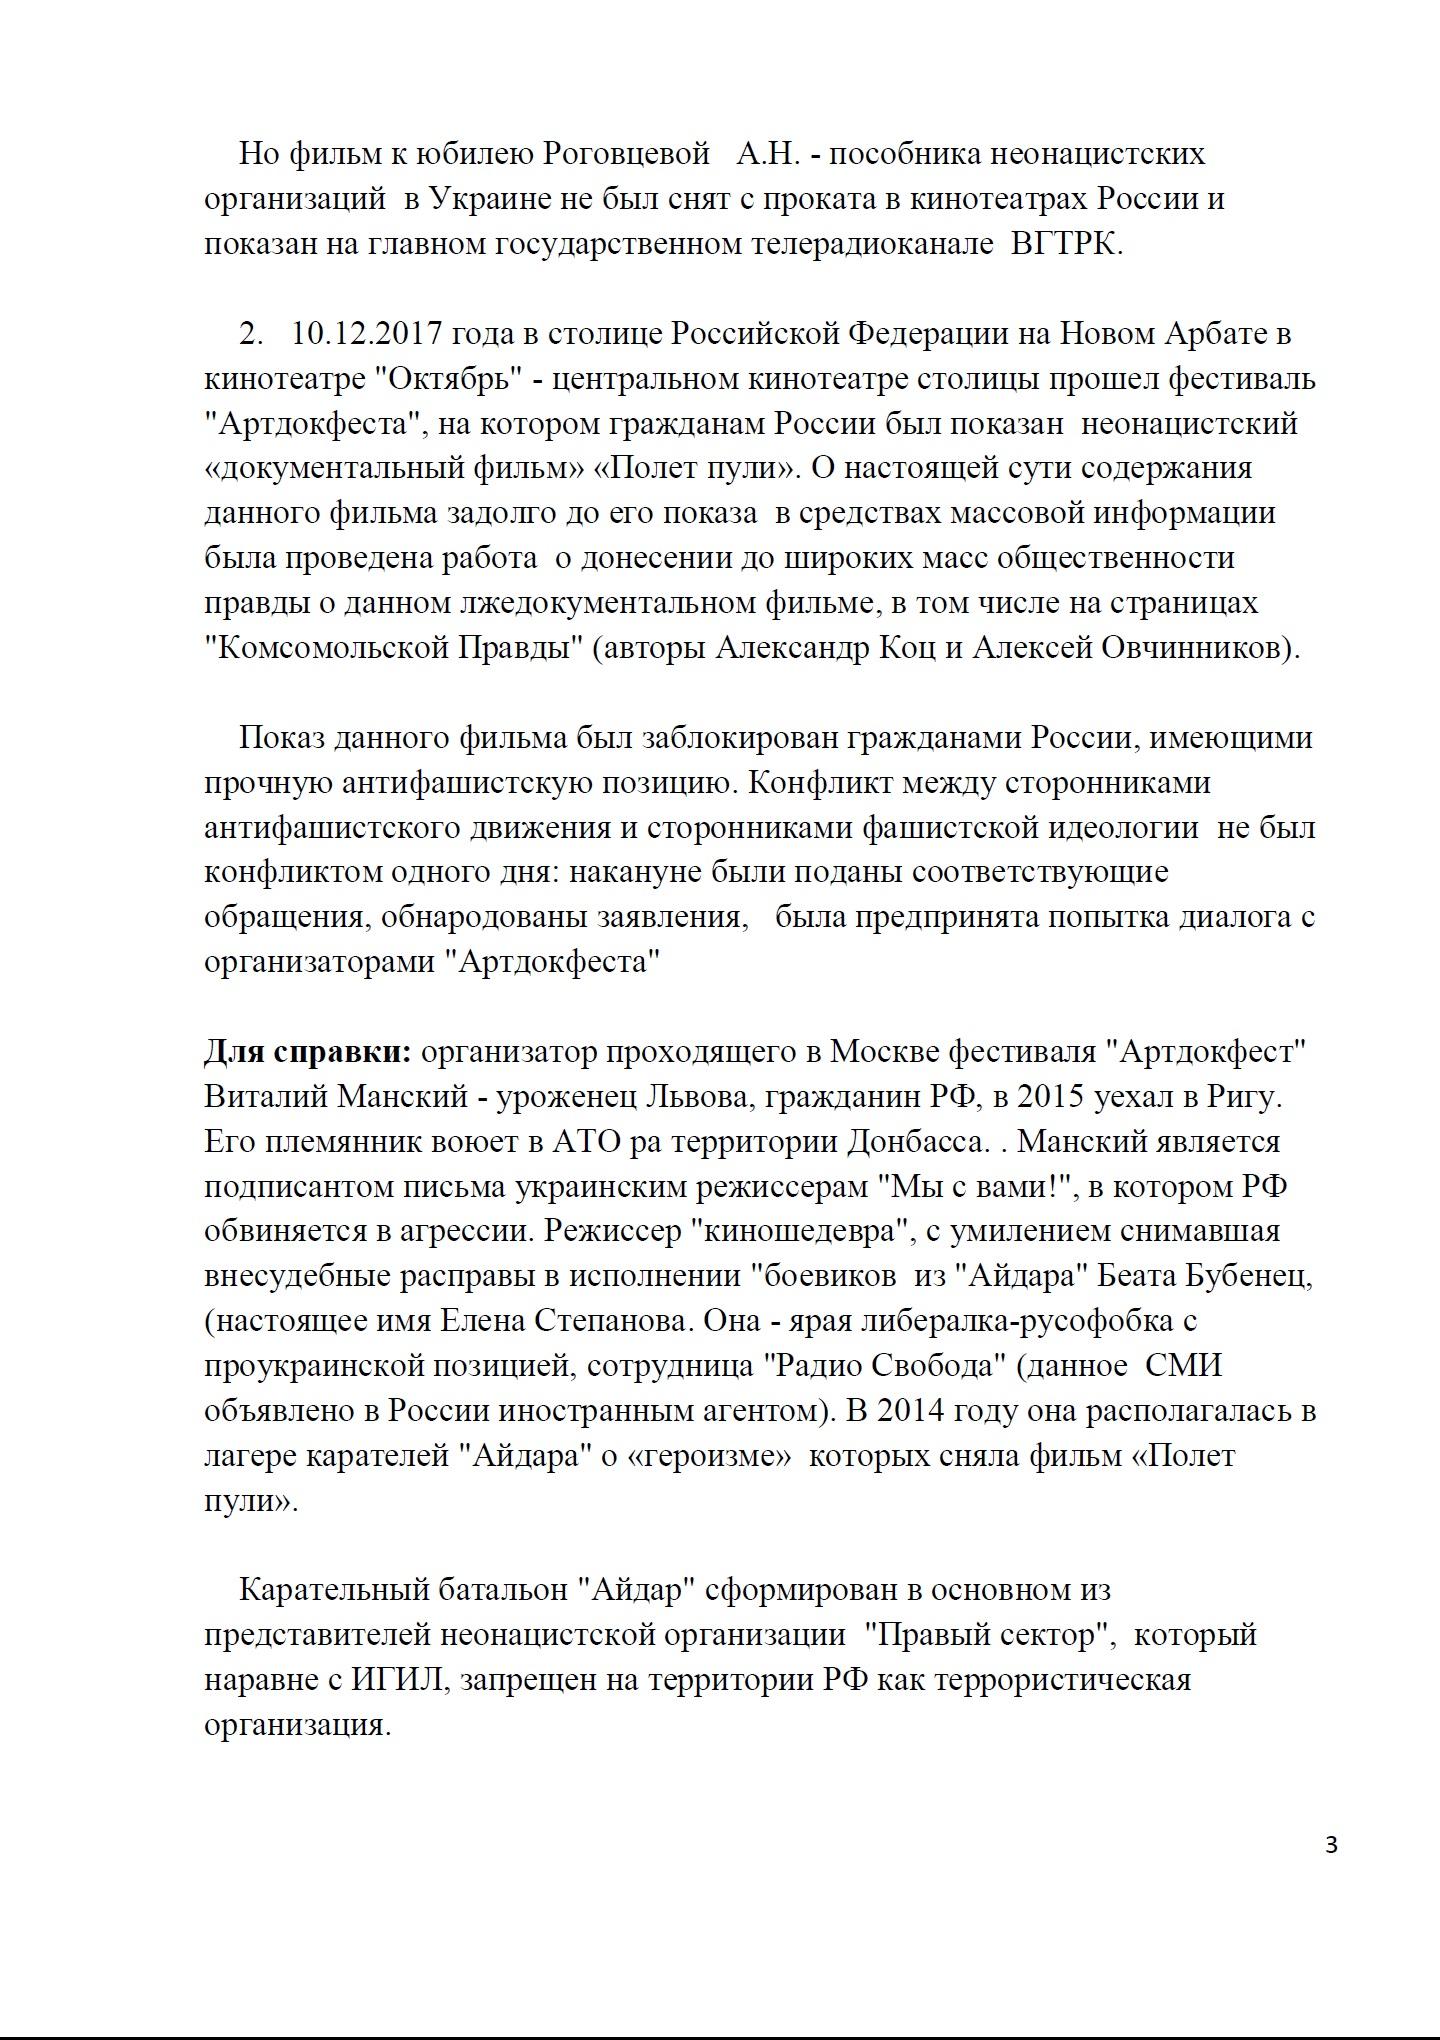 polet-puli-3